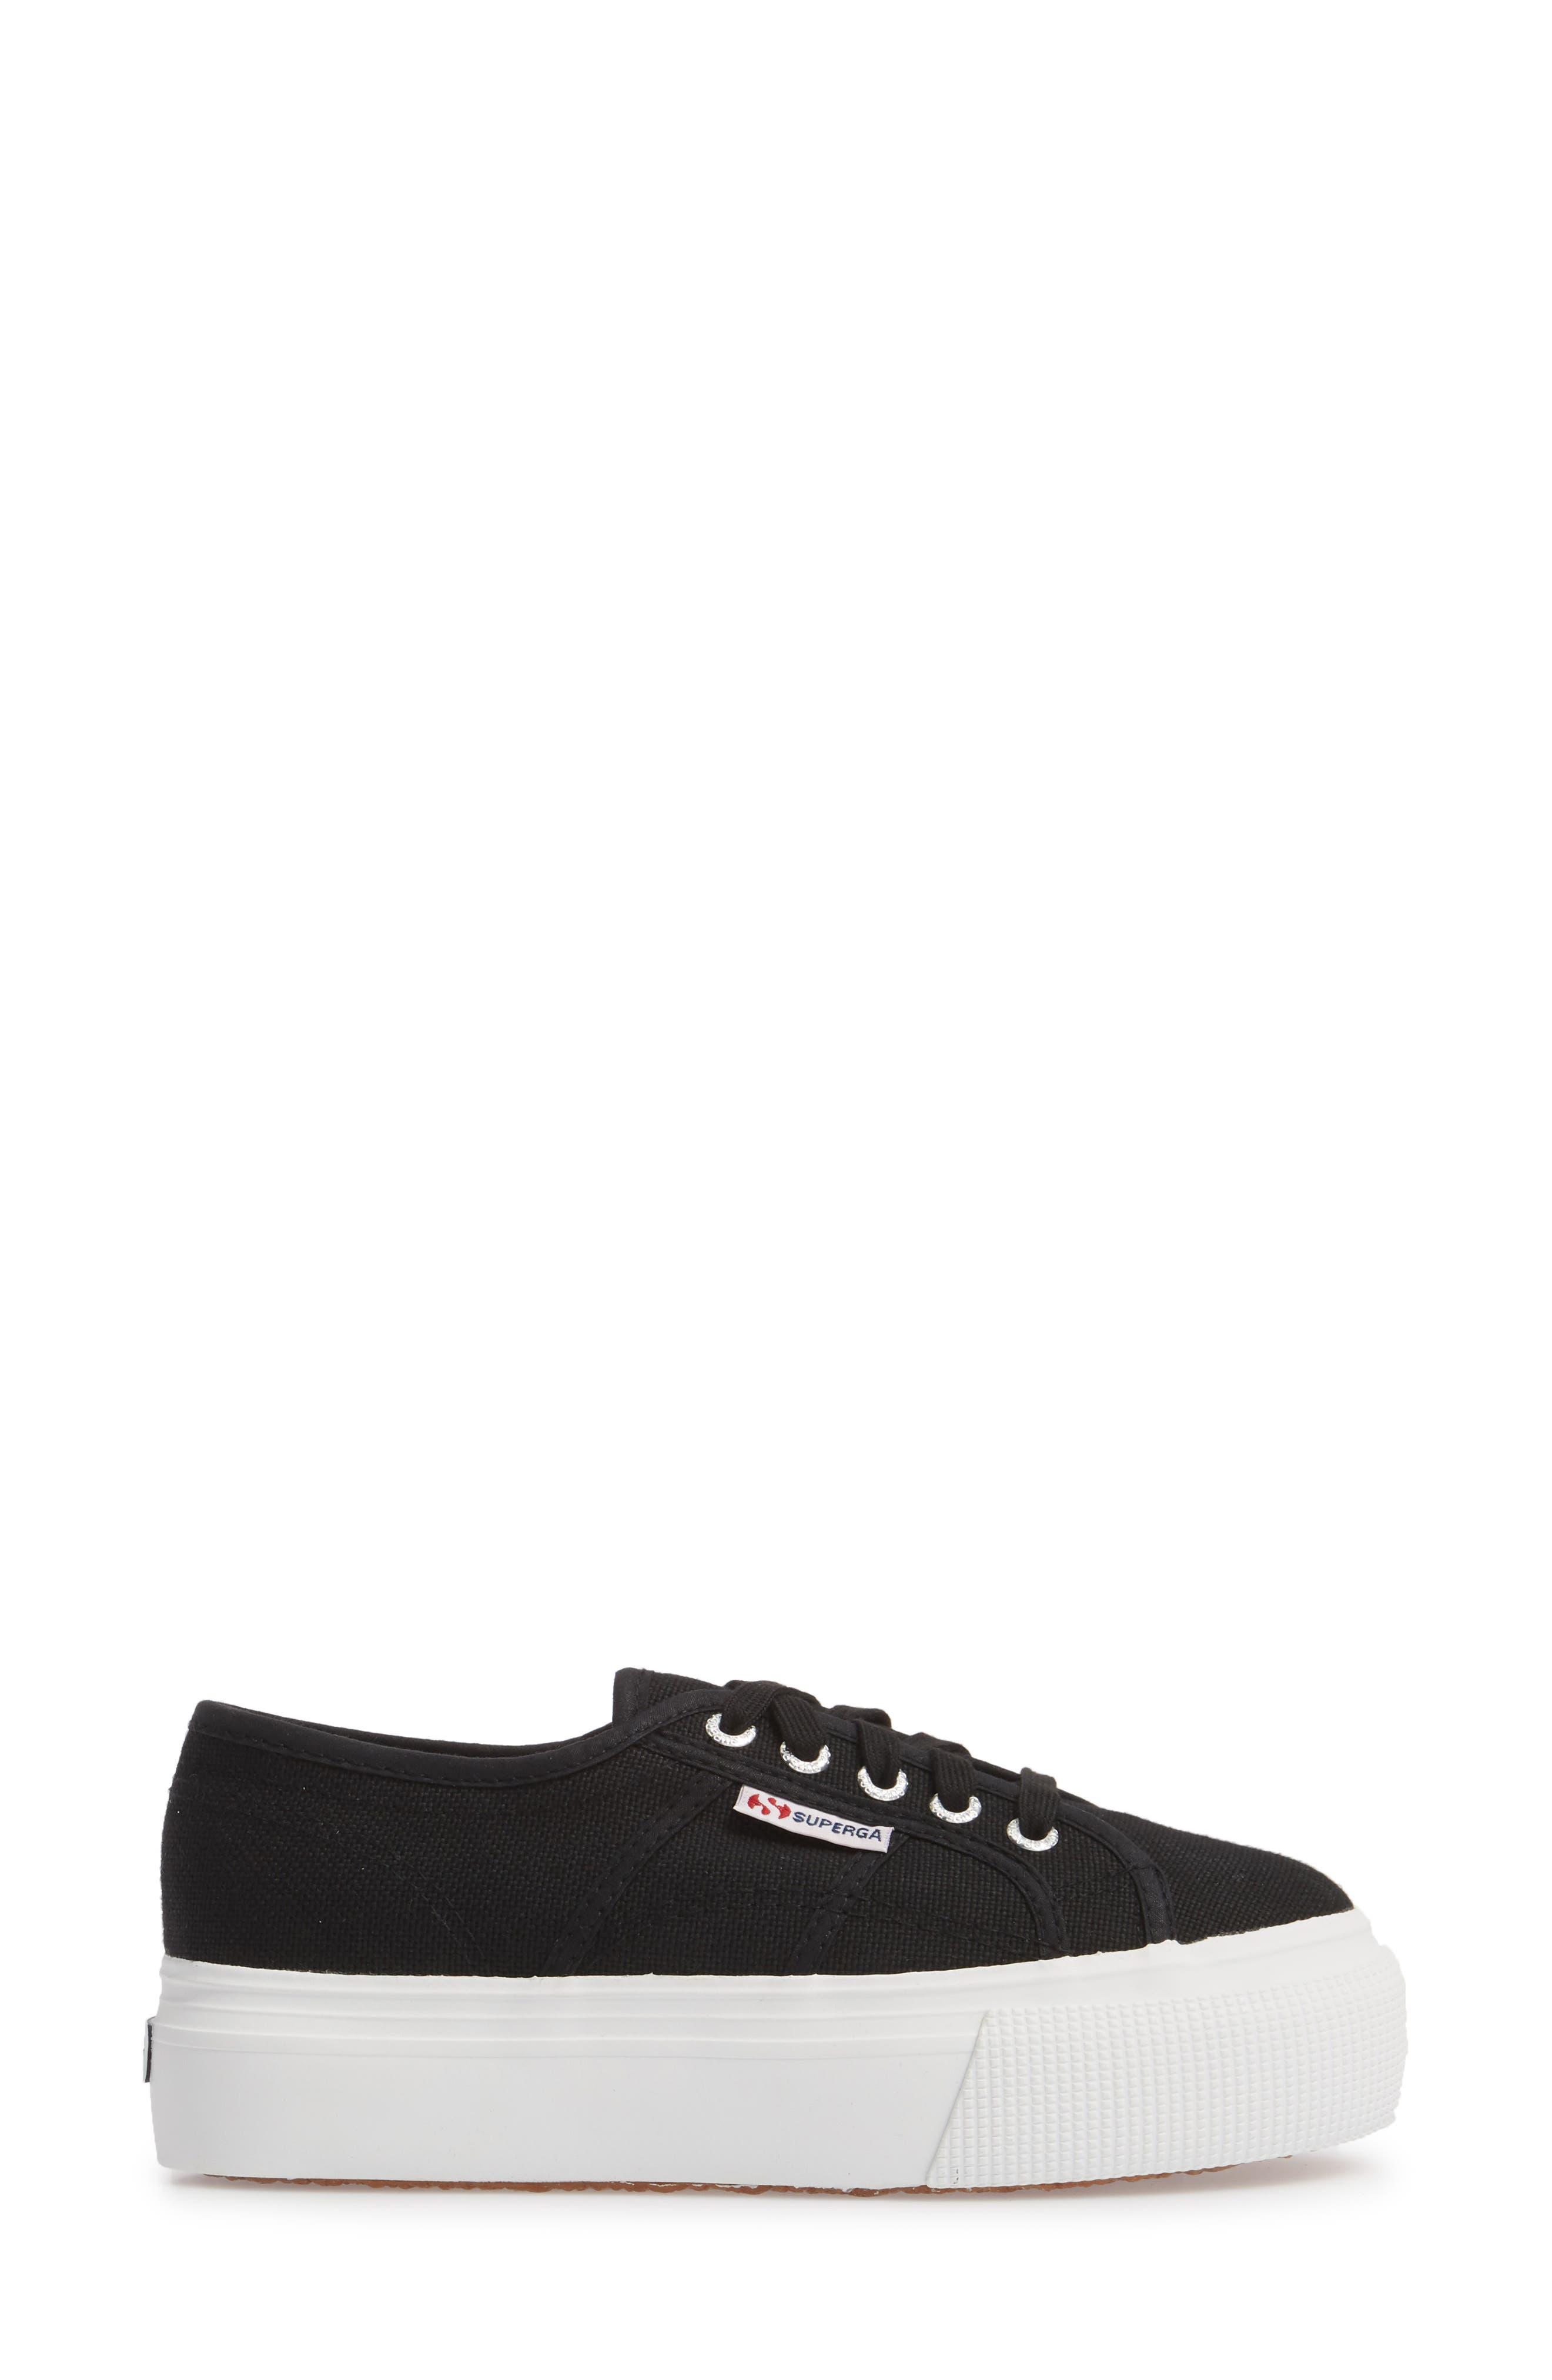 'Acot Linea' Sneaker,                             Alternate thumbnail 3, color,                             BLACK/ WHITE